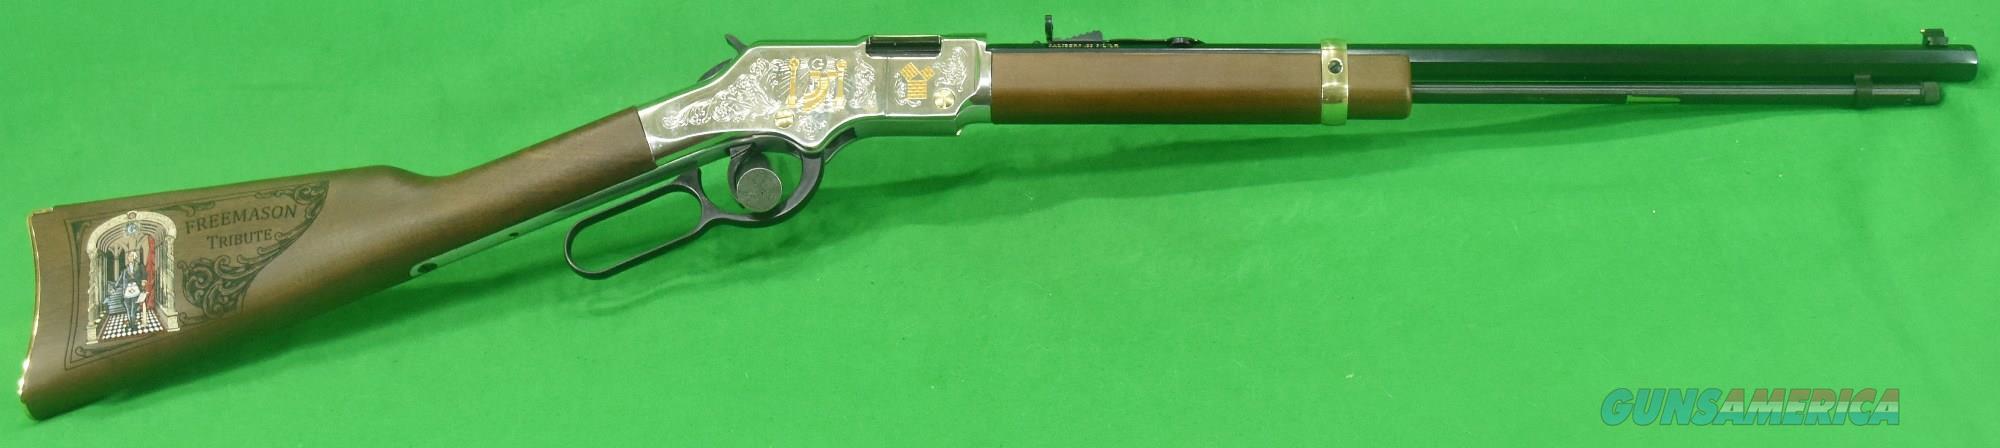 Golden Boy Freemasons Edit 22Lr 20In  H004MAS  Guns > Rifles > Henry Rifles - Replica